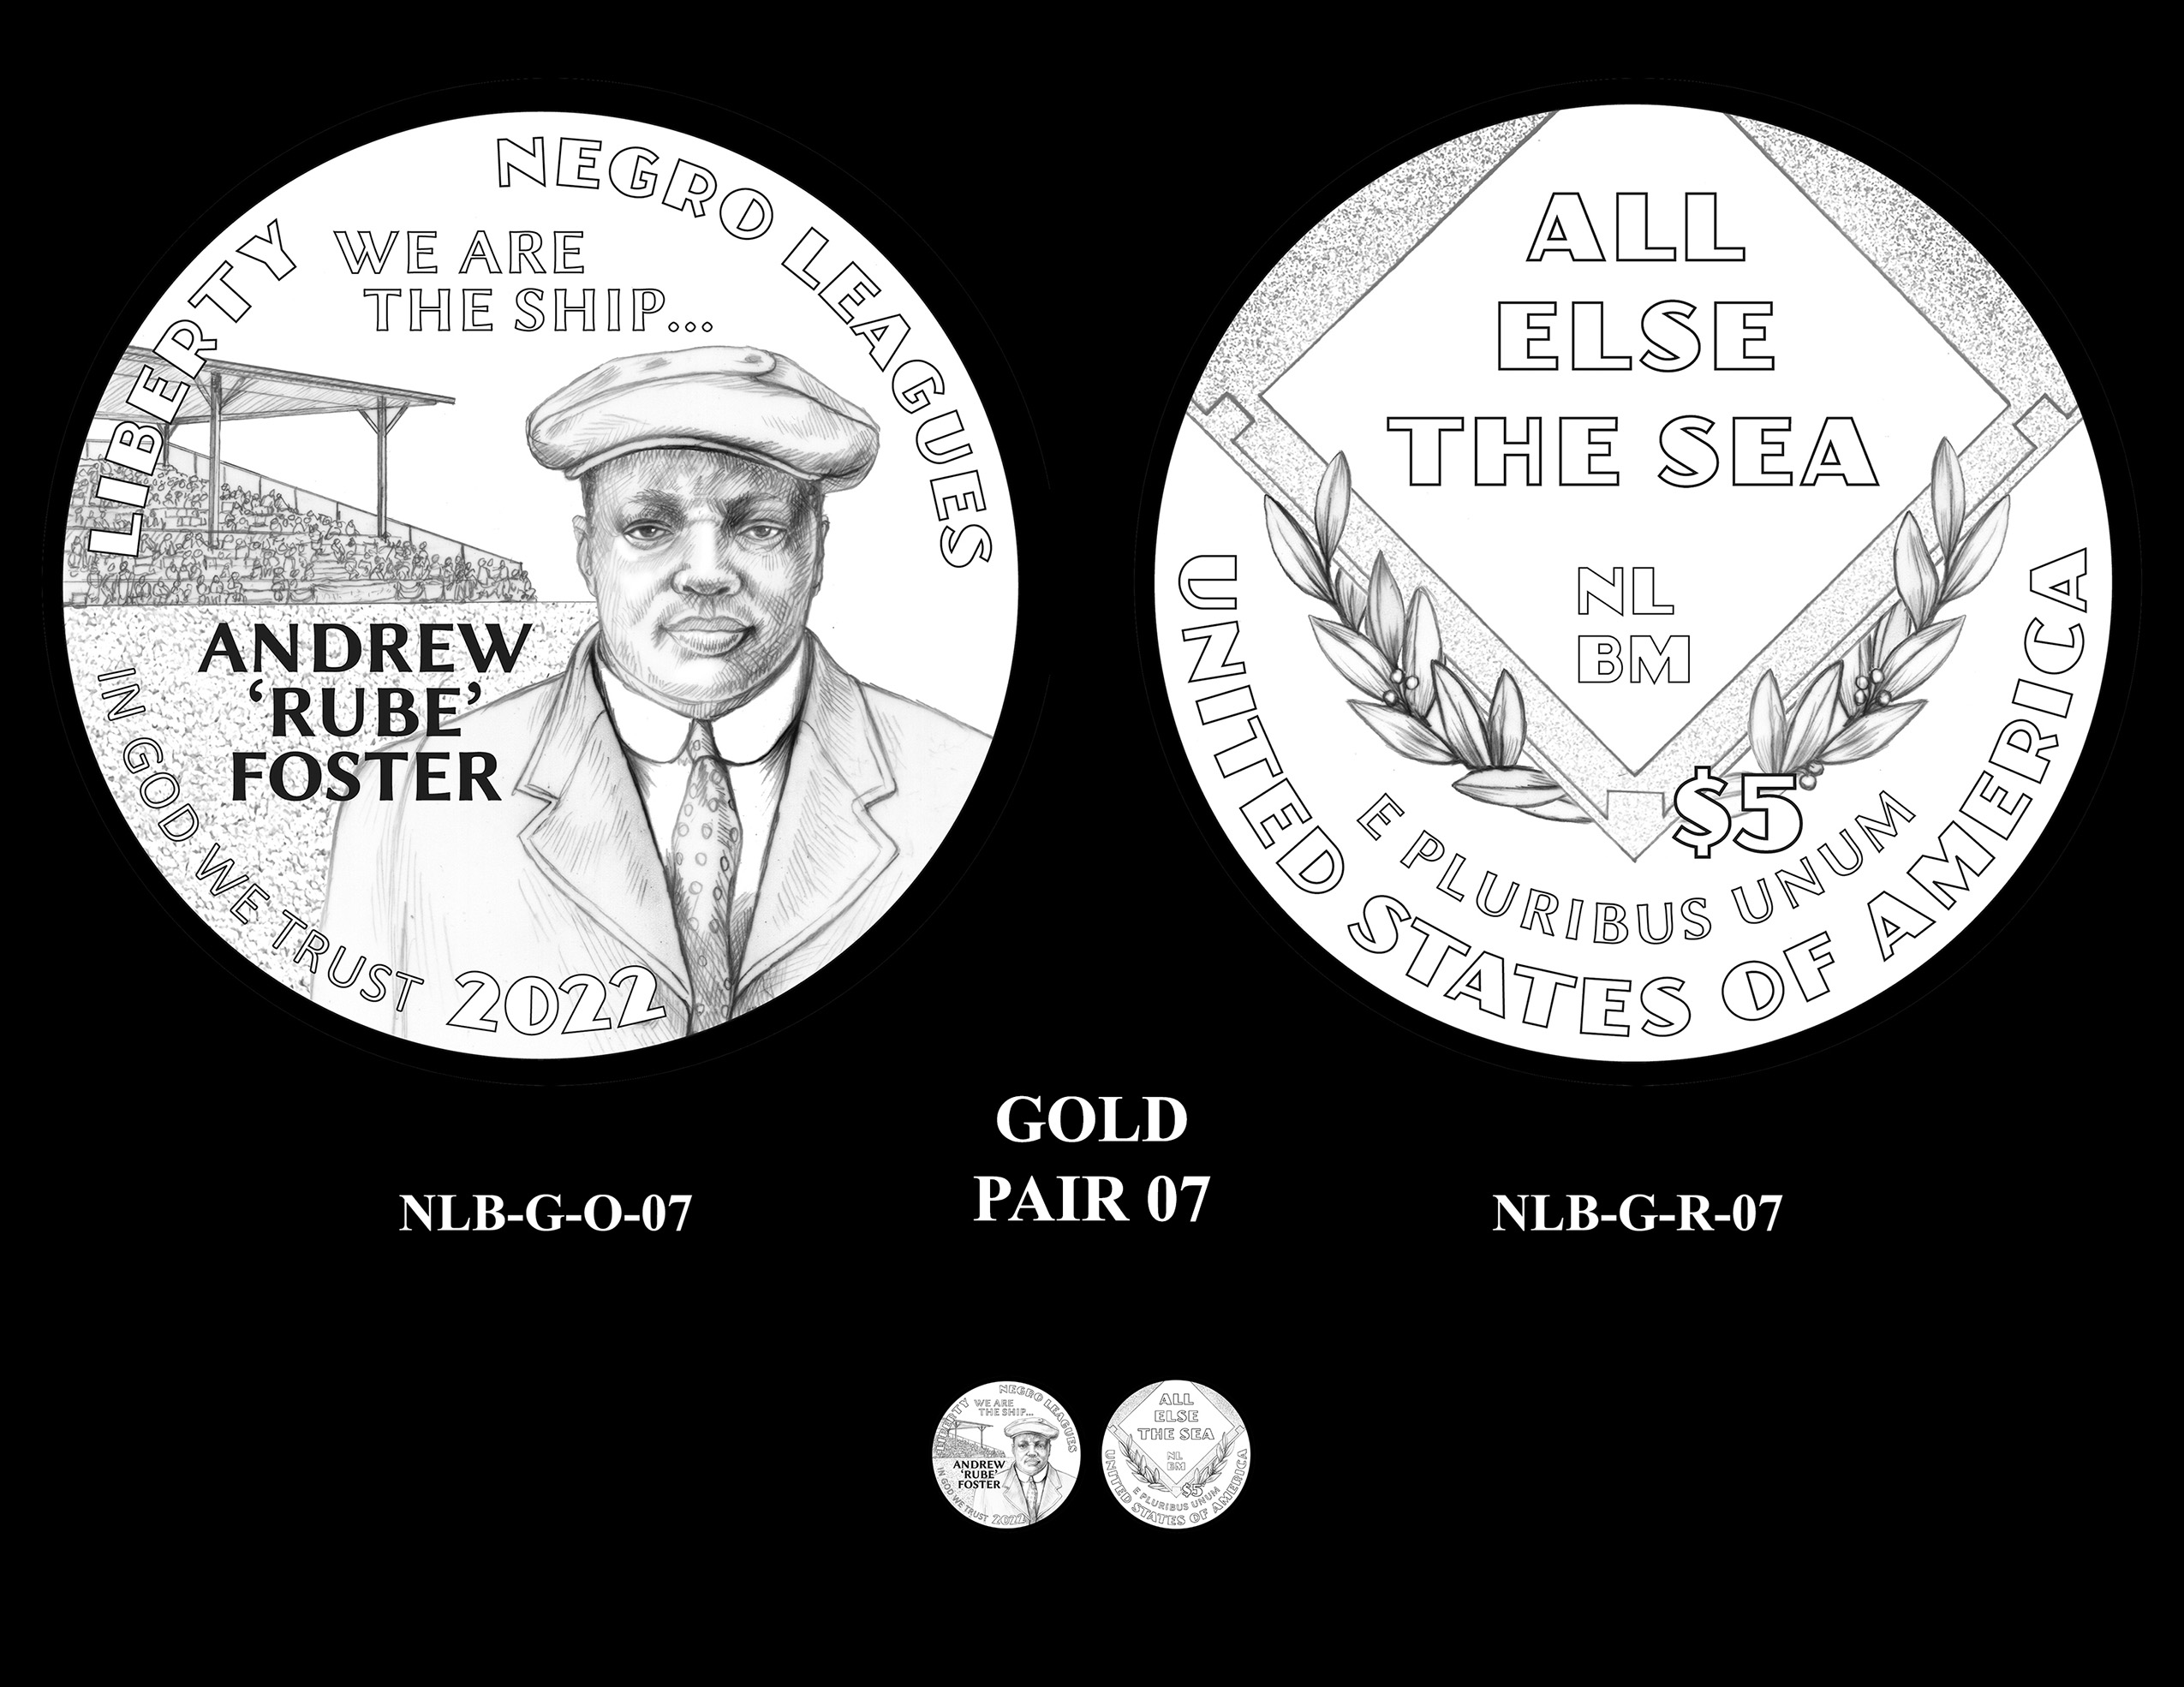 Gold Pair 07 -- Negro Leagues Baseball Commemorative Coin Program